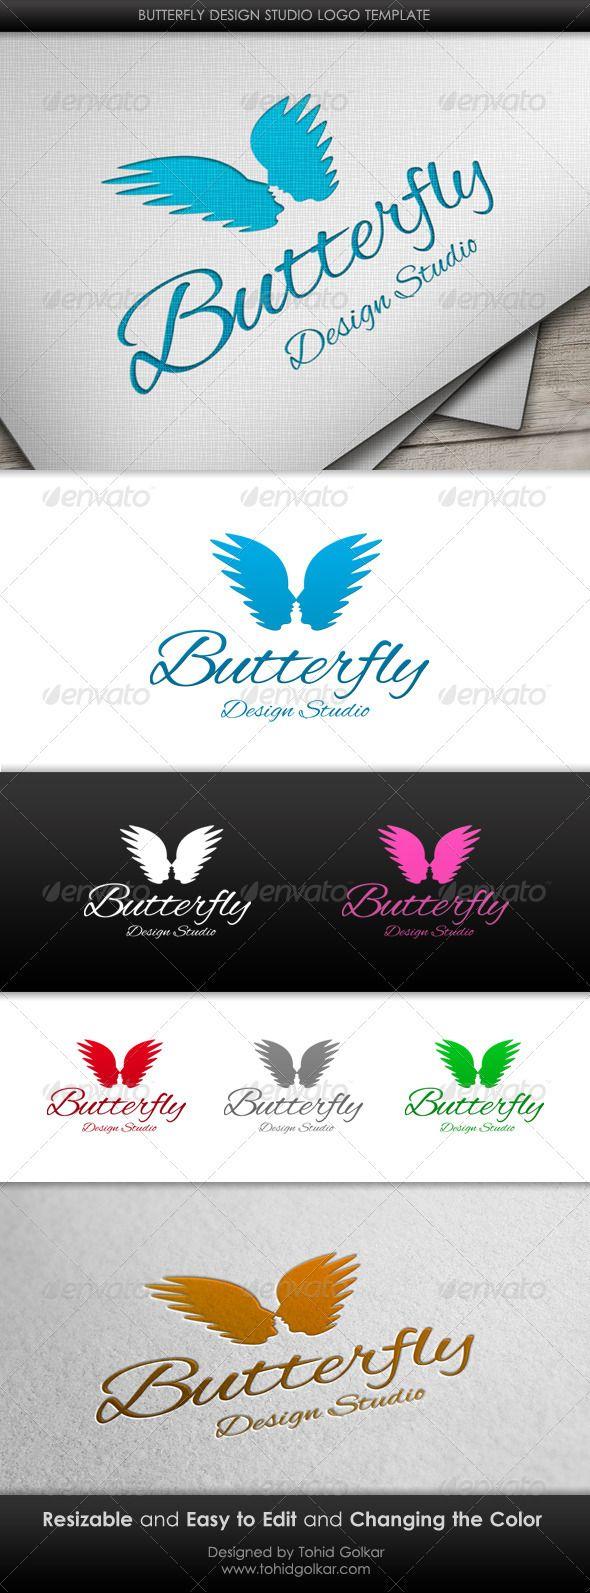 Butterfly Design Studio Logo Template